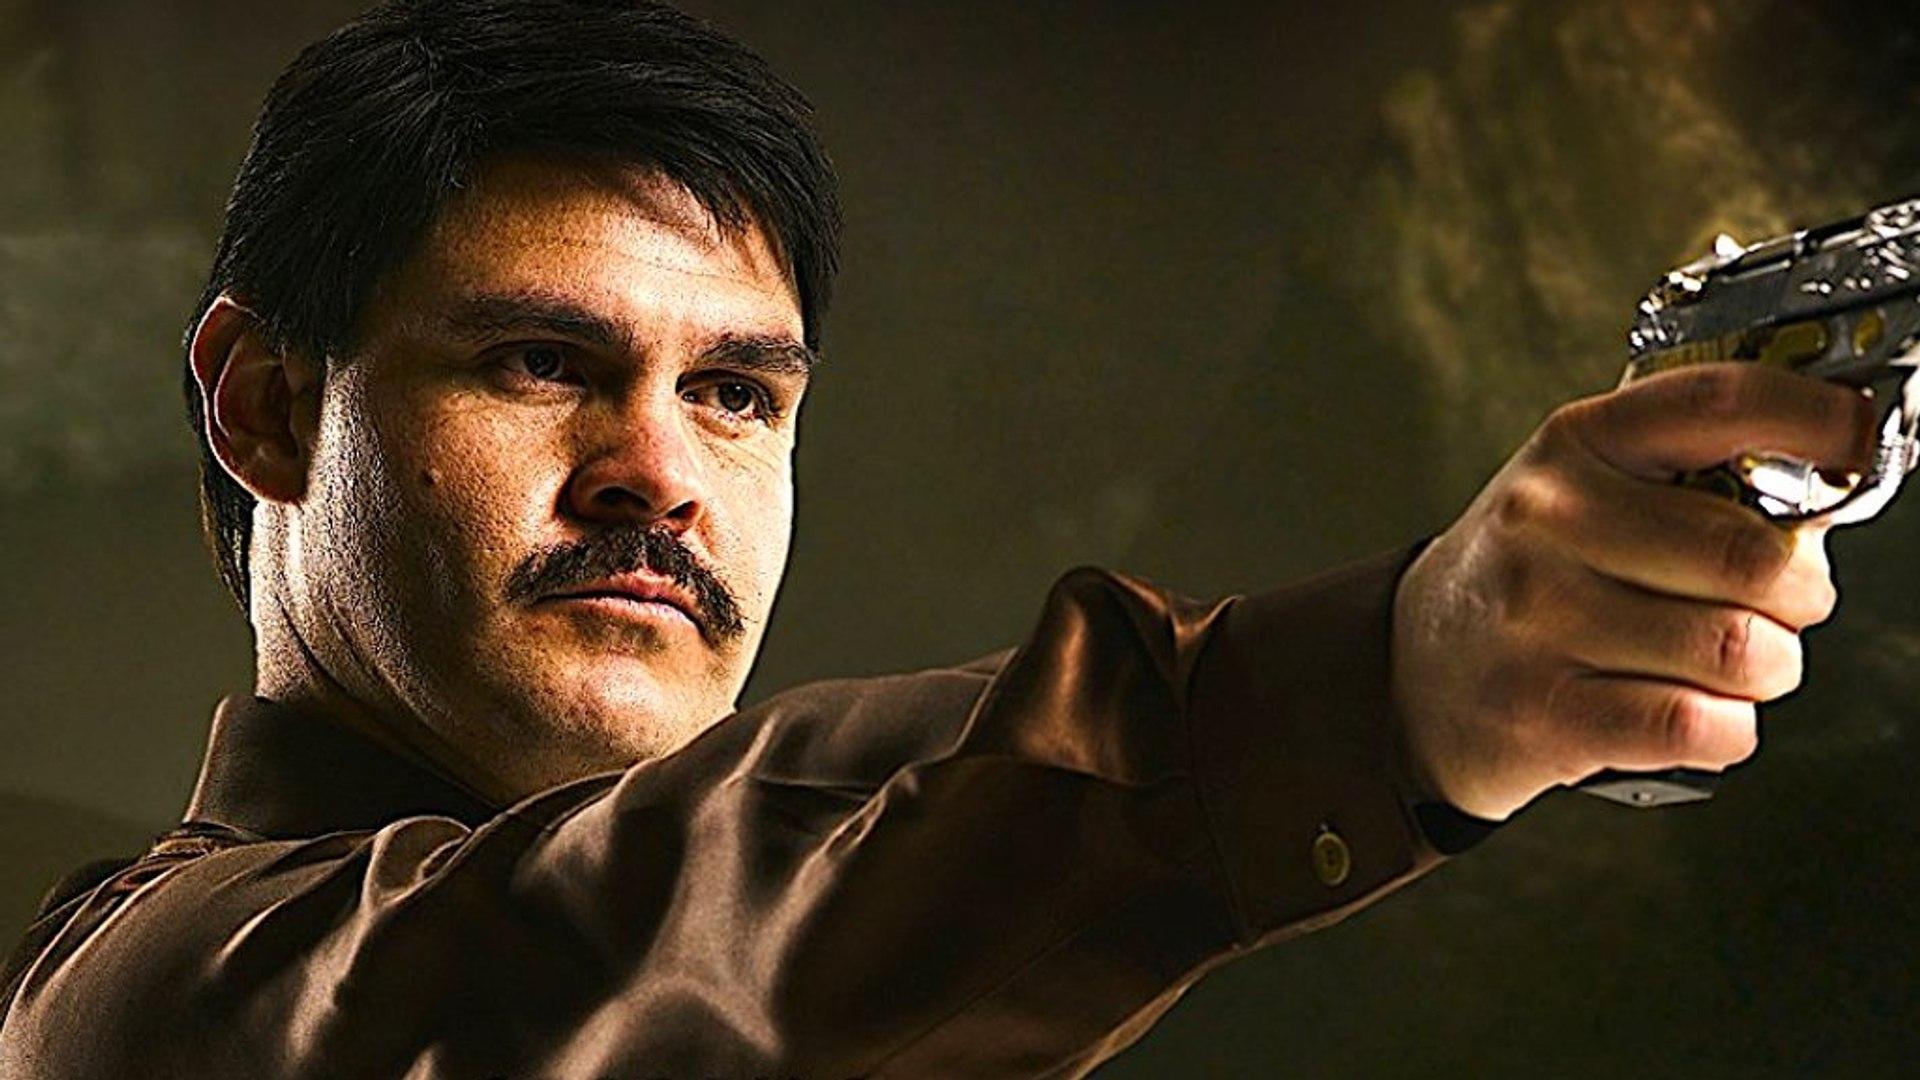 El Chapo Season 2 on Netflix - Official Trailer - video Dailymotion